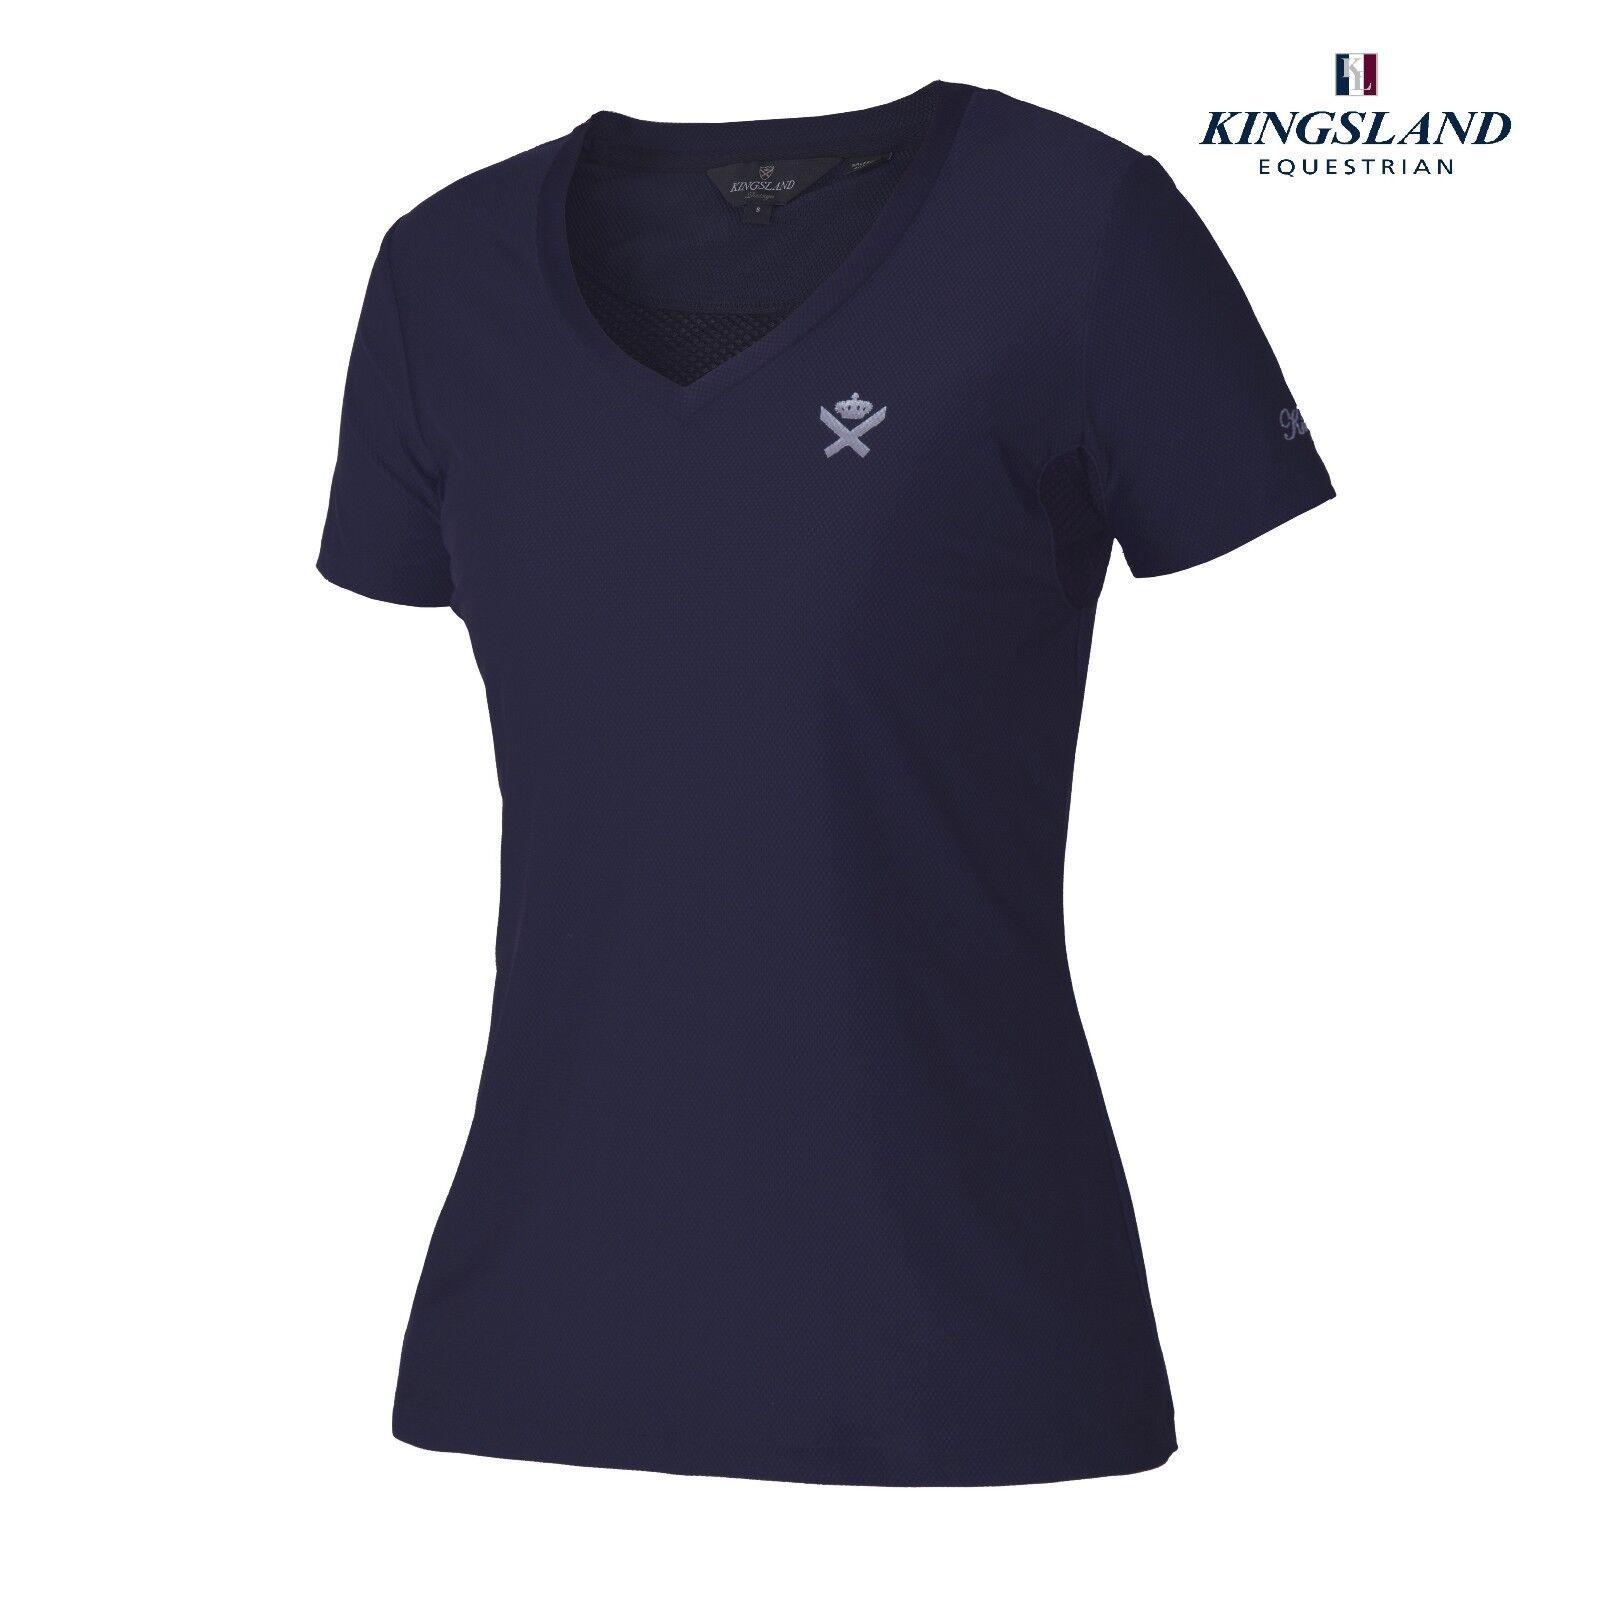 Kingsland Brentina Ladies T-shirt bluee medieval Ladies 186-PT-413 Sale